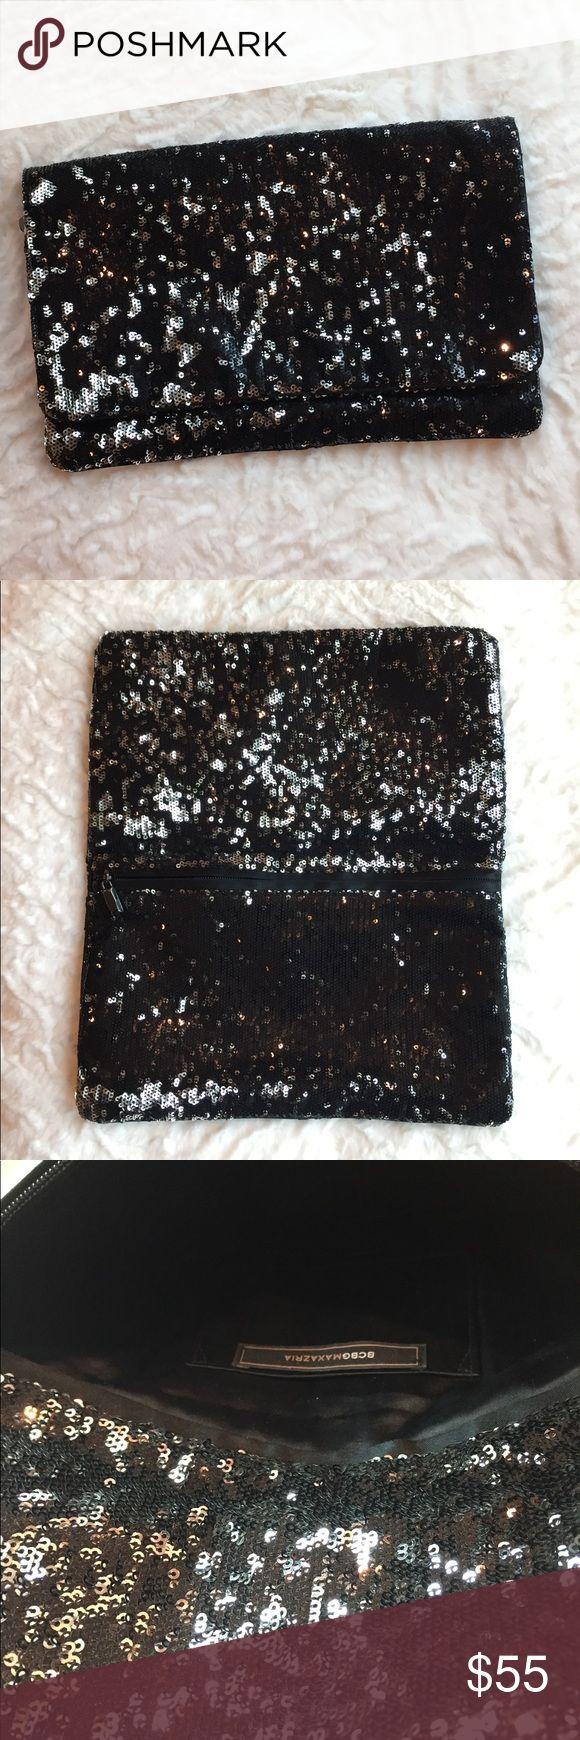 "BCBGMAXAZRIA Sequin Clutch BCBGMAXAZRIA Sequin Clutch. Black/Silver. 11"" W x 7""H. Fold over with magnetic closure. Great Condition. Gorgeous sparkling clutch! BCBGMaxAzria Bags"